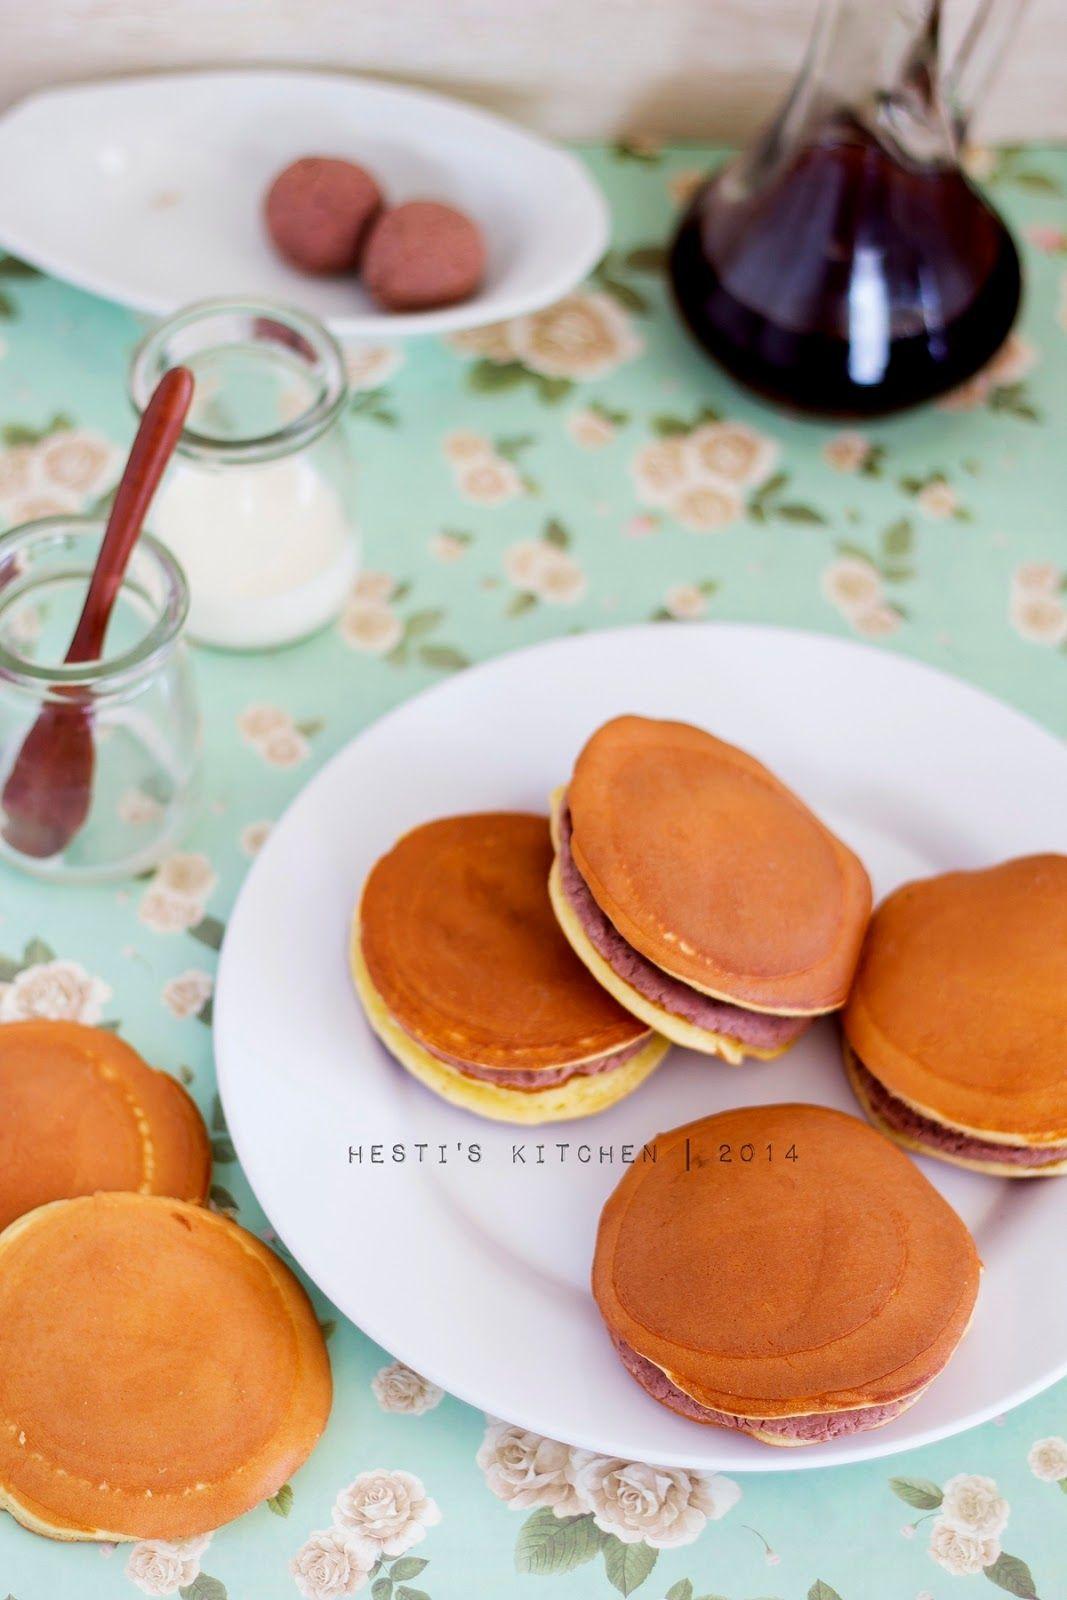 Hesti S Kitchen Yummy For Your Tummy Snack Jepang Resep Kacang Merah Kue Cantik